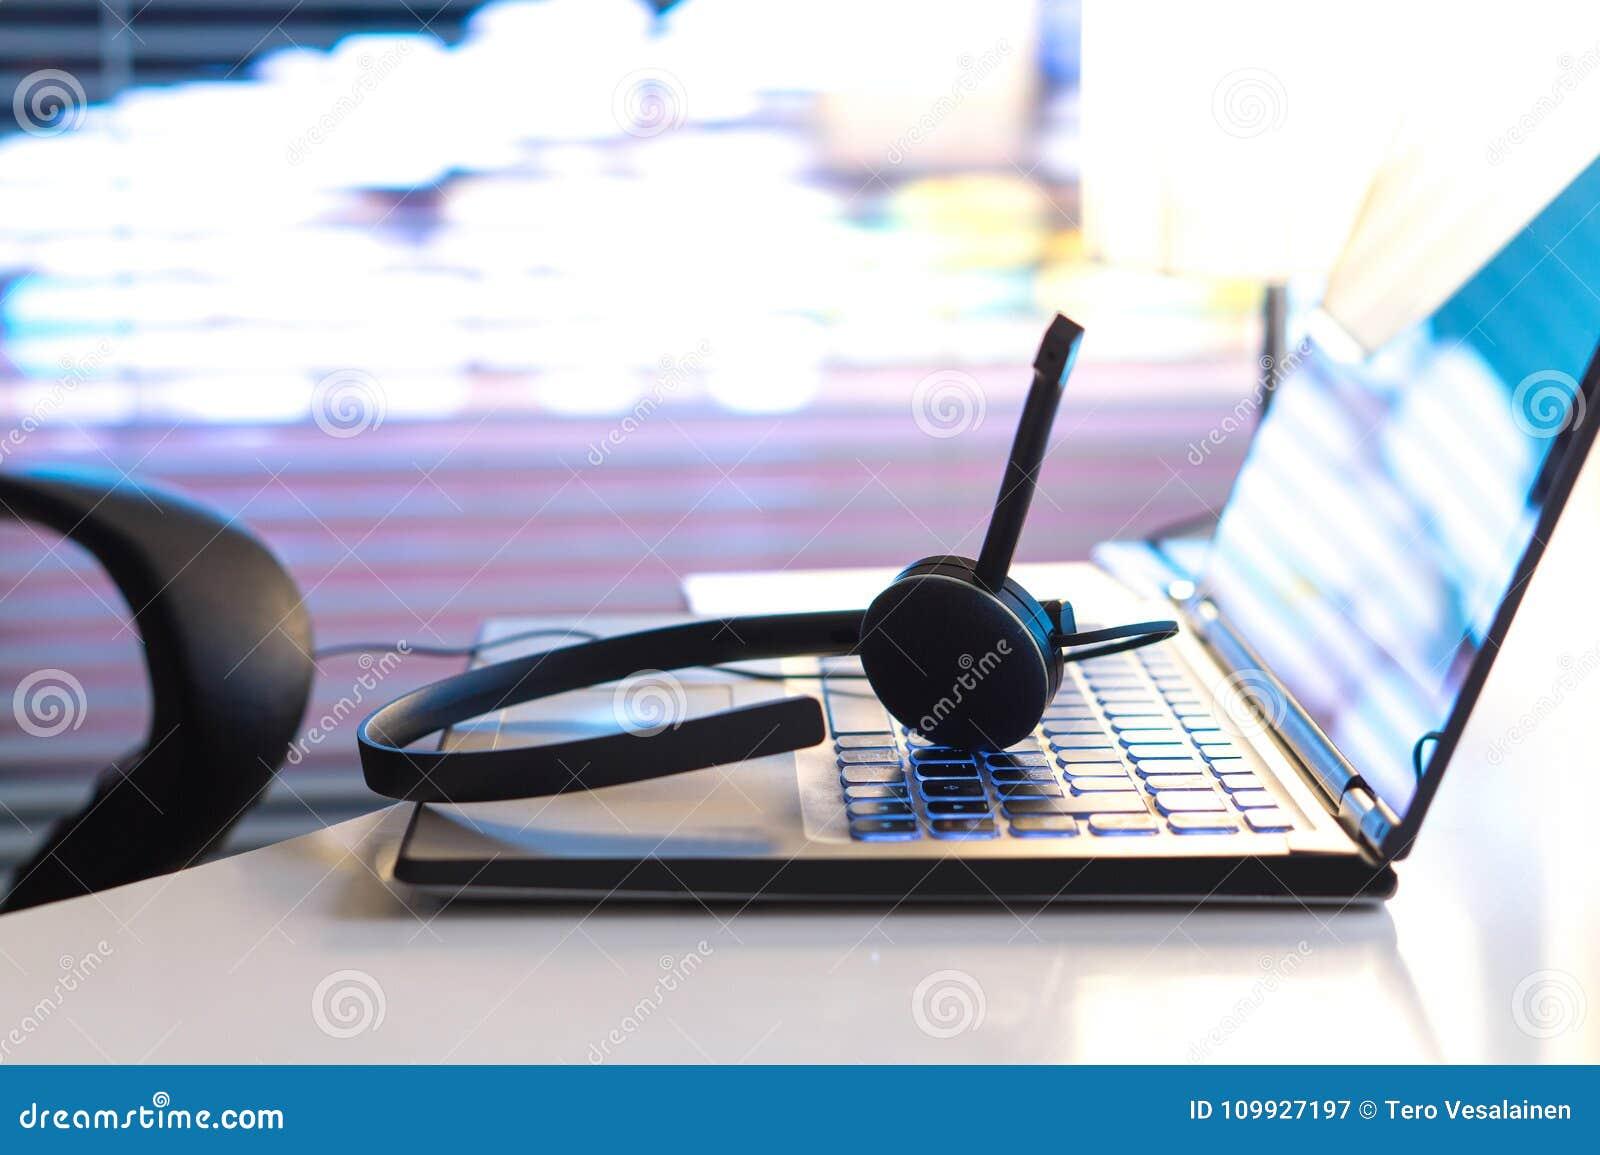 Helpdesk, de 24/7 klantendienst, steunhotline of call centre